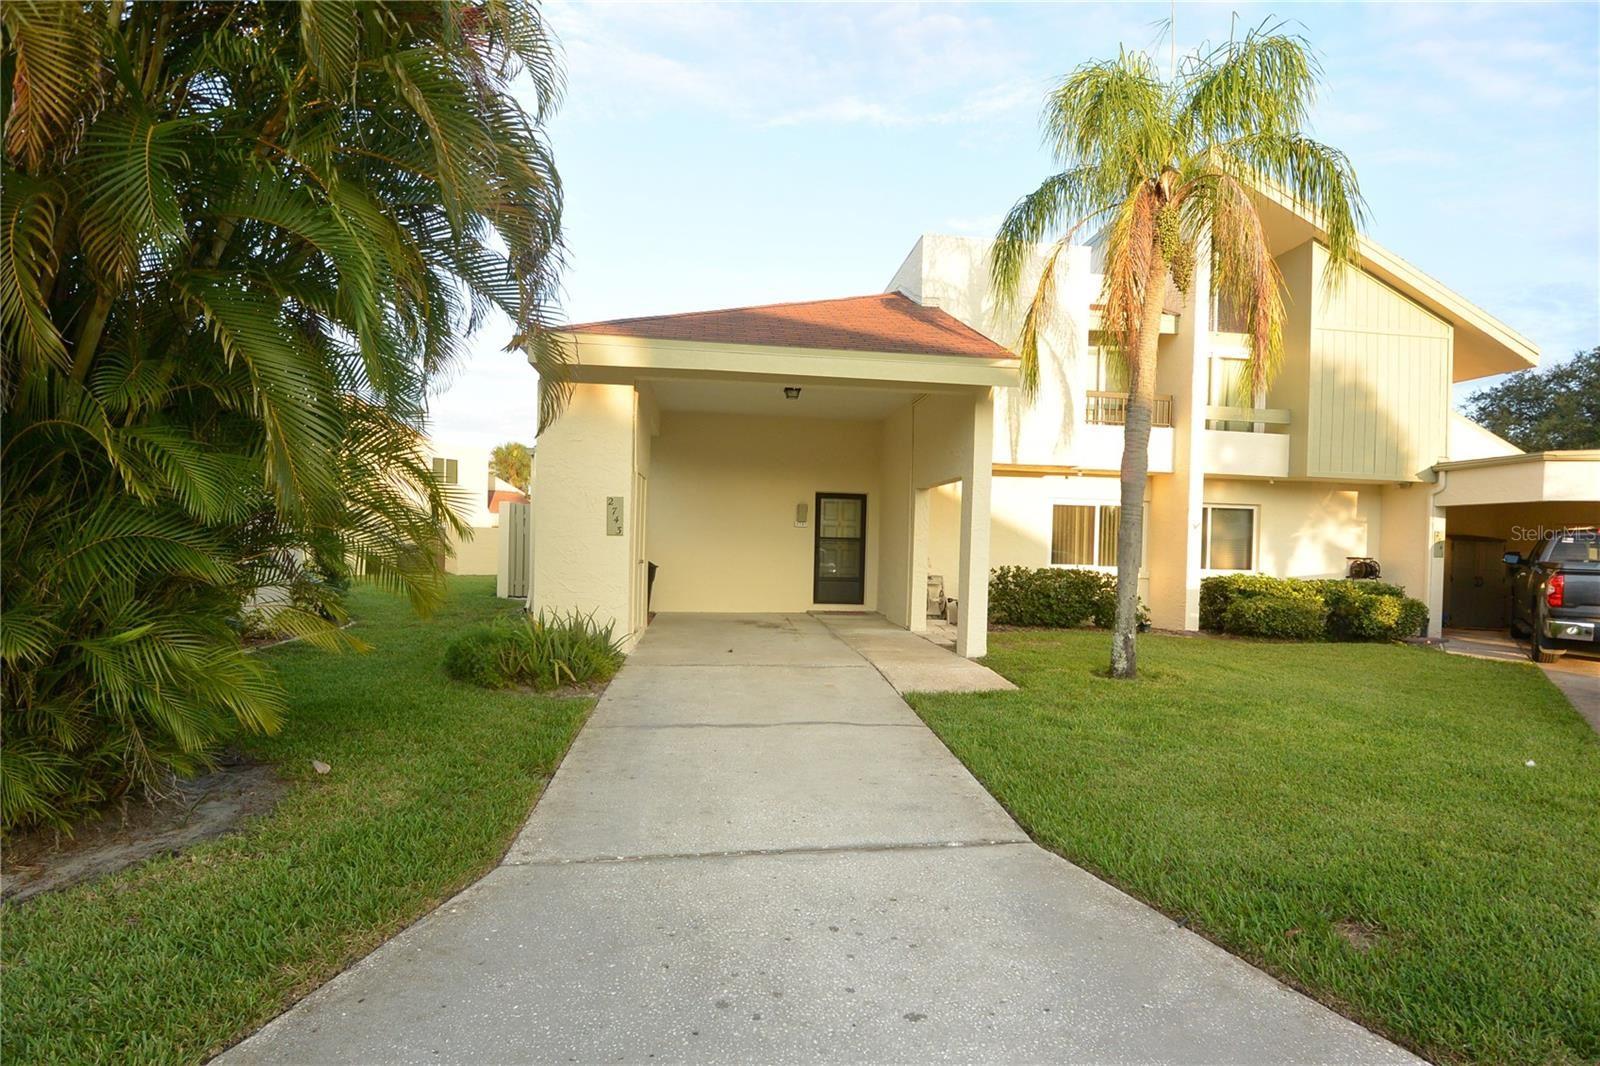 2743 HAVERHILL COURT, Clearwater, FL 33761 - #: U8126744